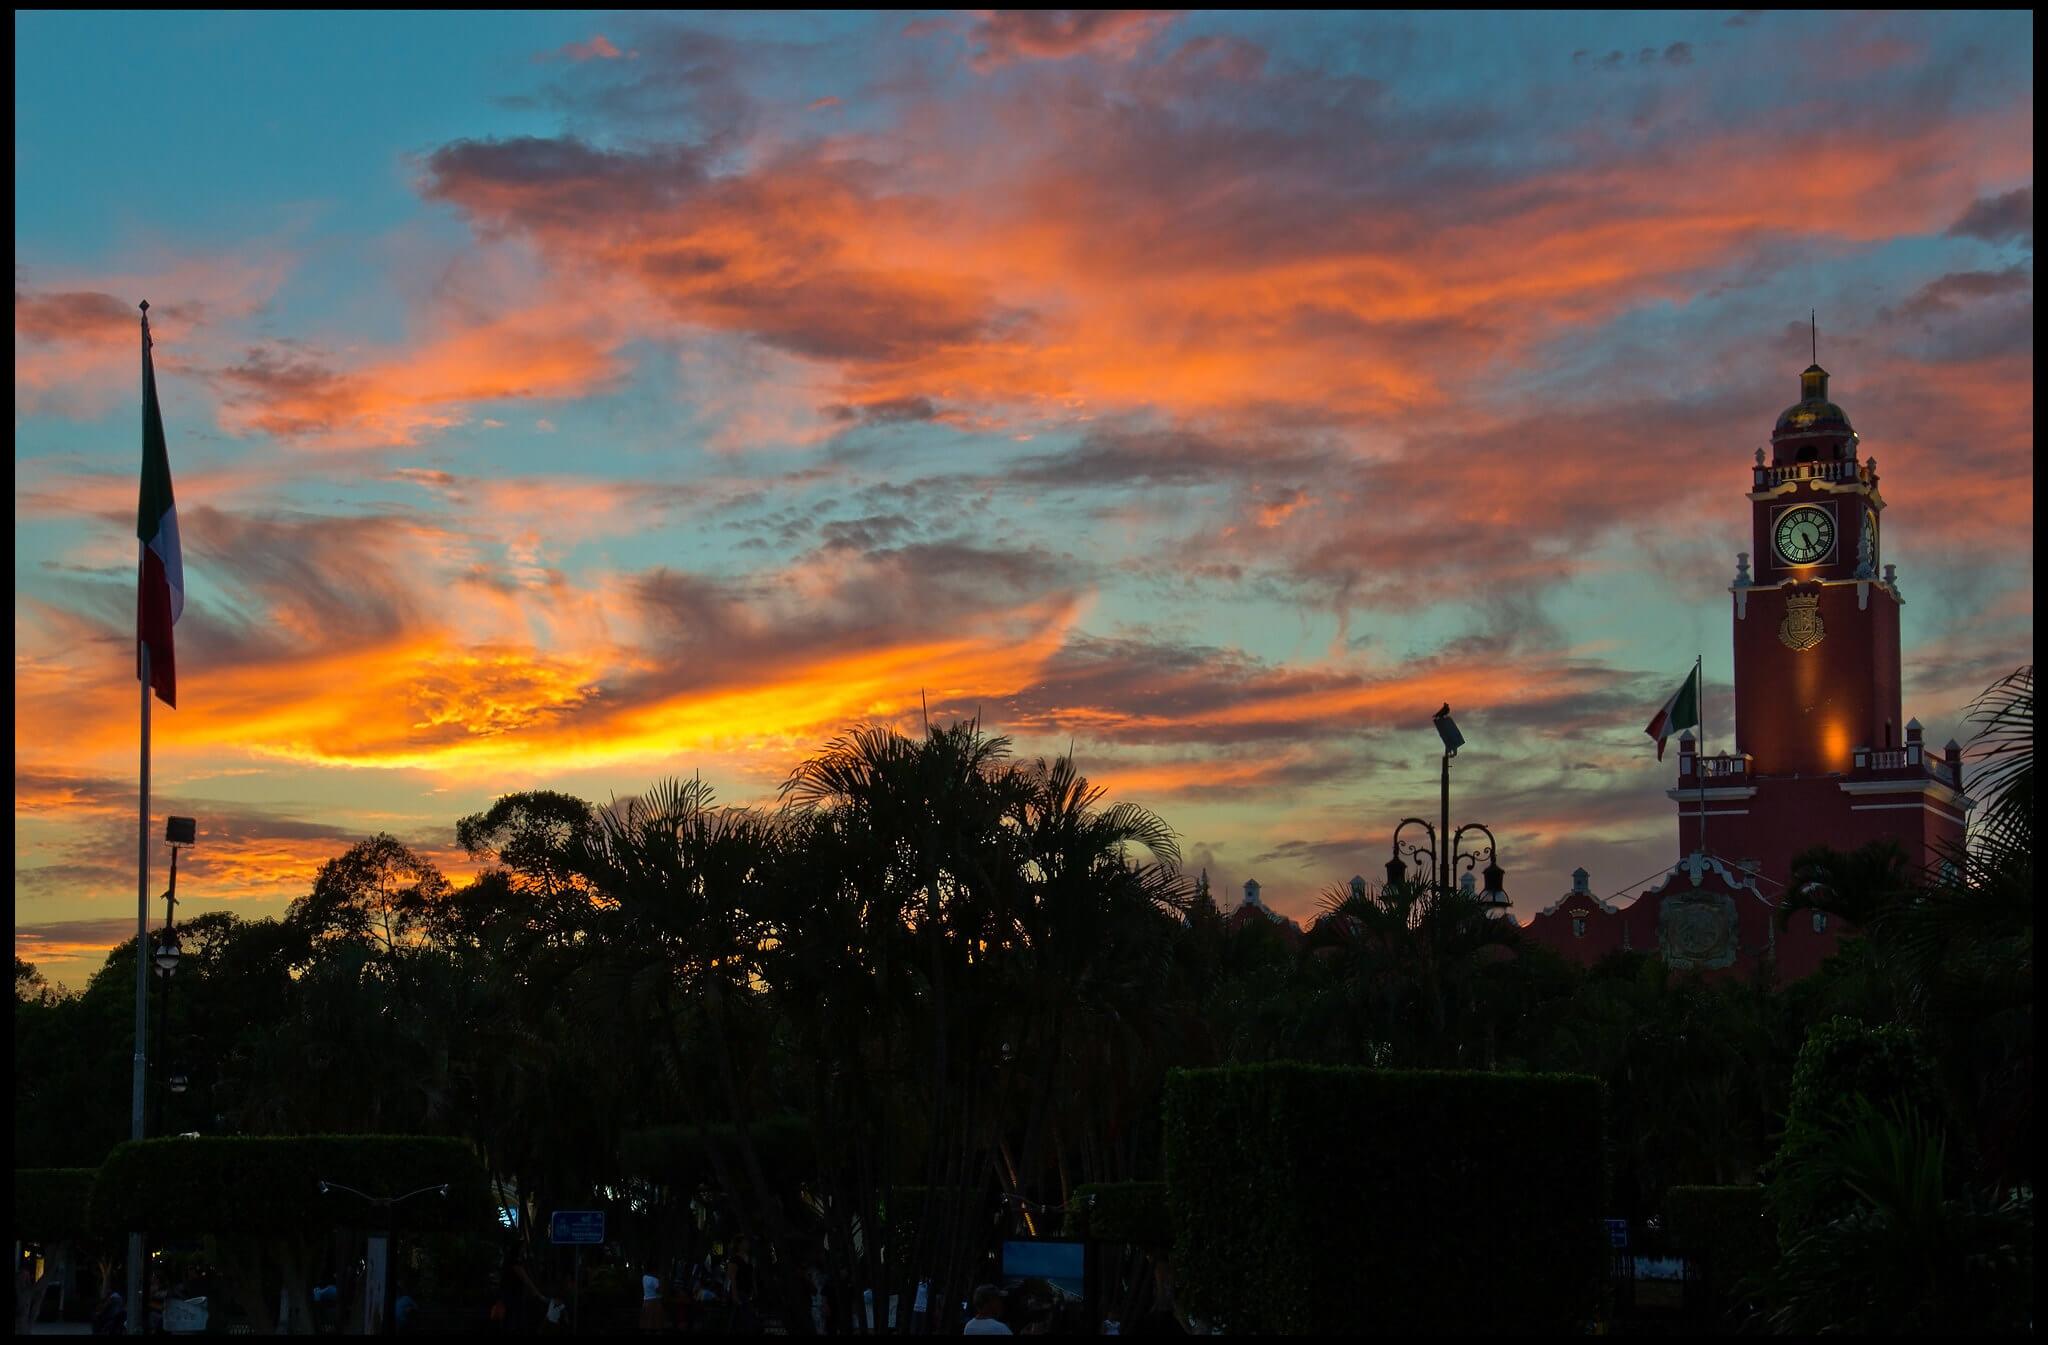 sunset in merida mexico at plaza grande